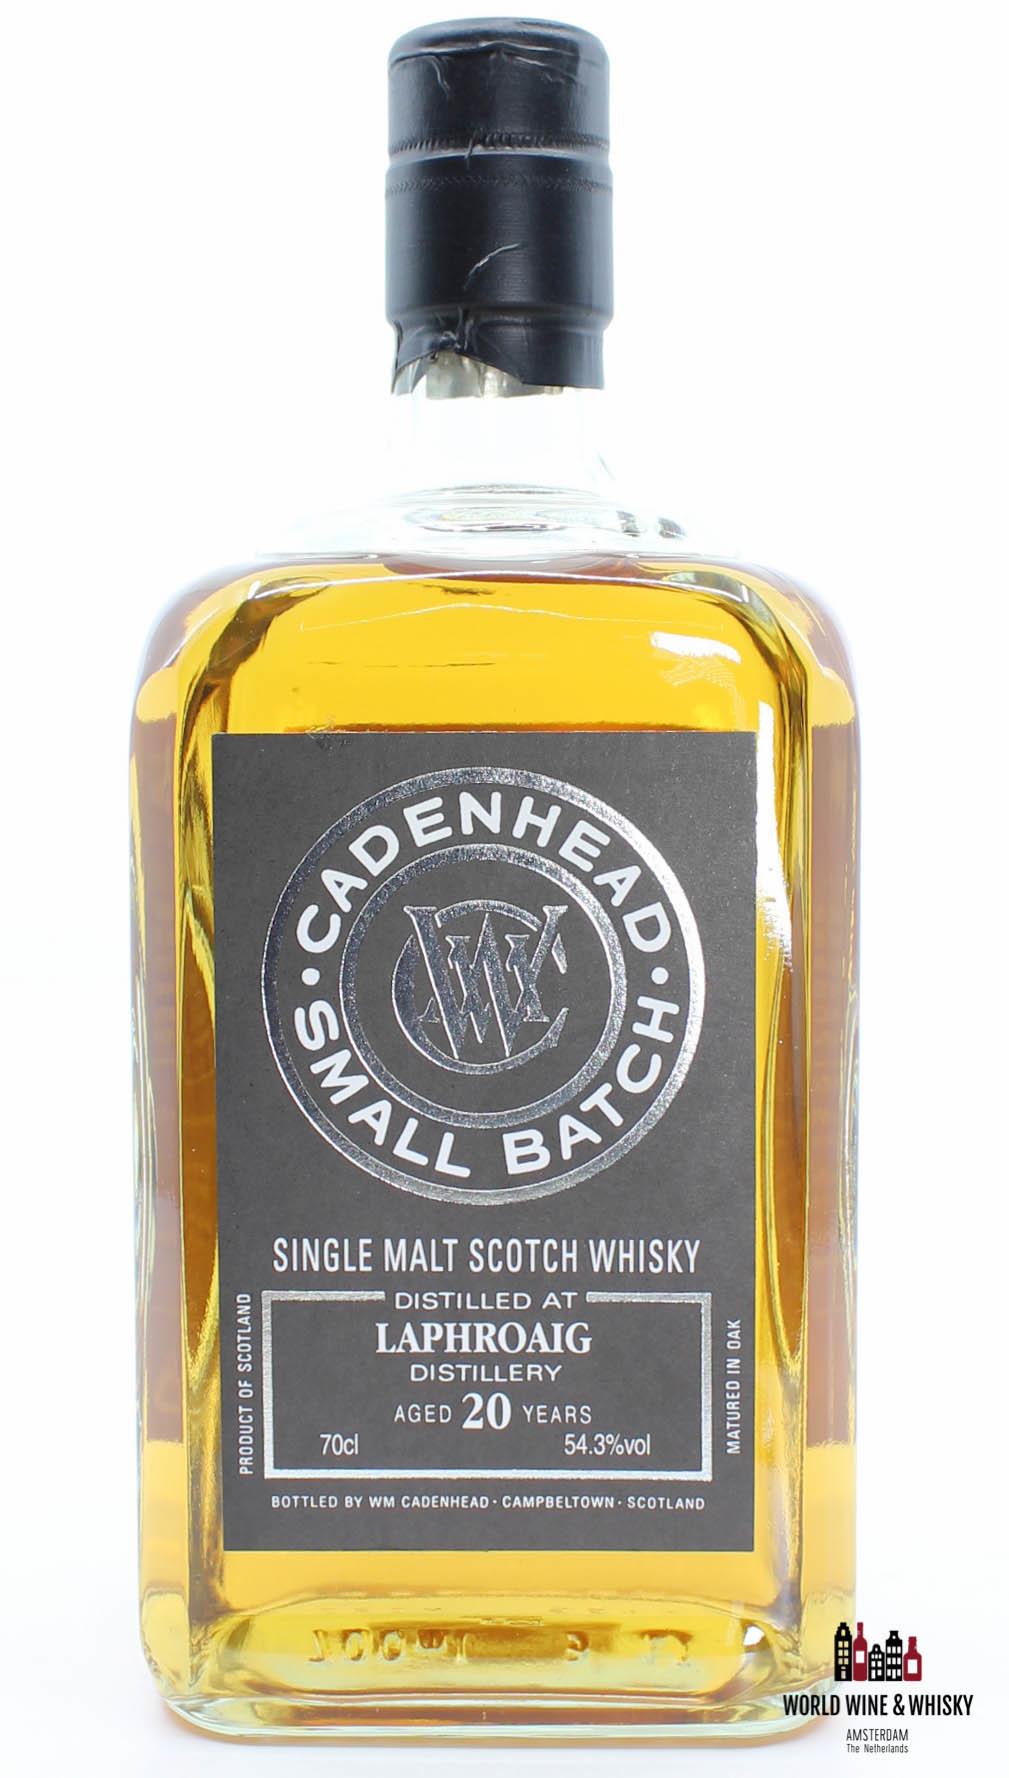 Laphroaig Laphroaig 20 Years Old 1998 2018 Cadenhead - Small Batch 54.3% (one of 474 bottles)